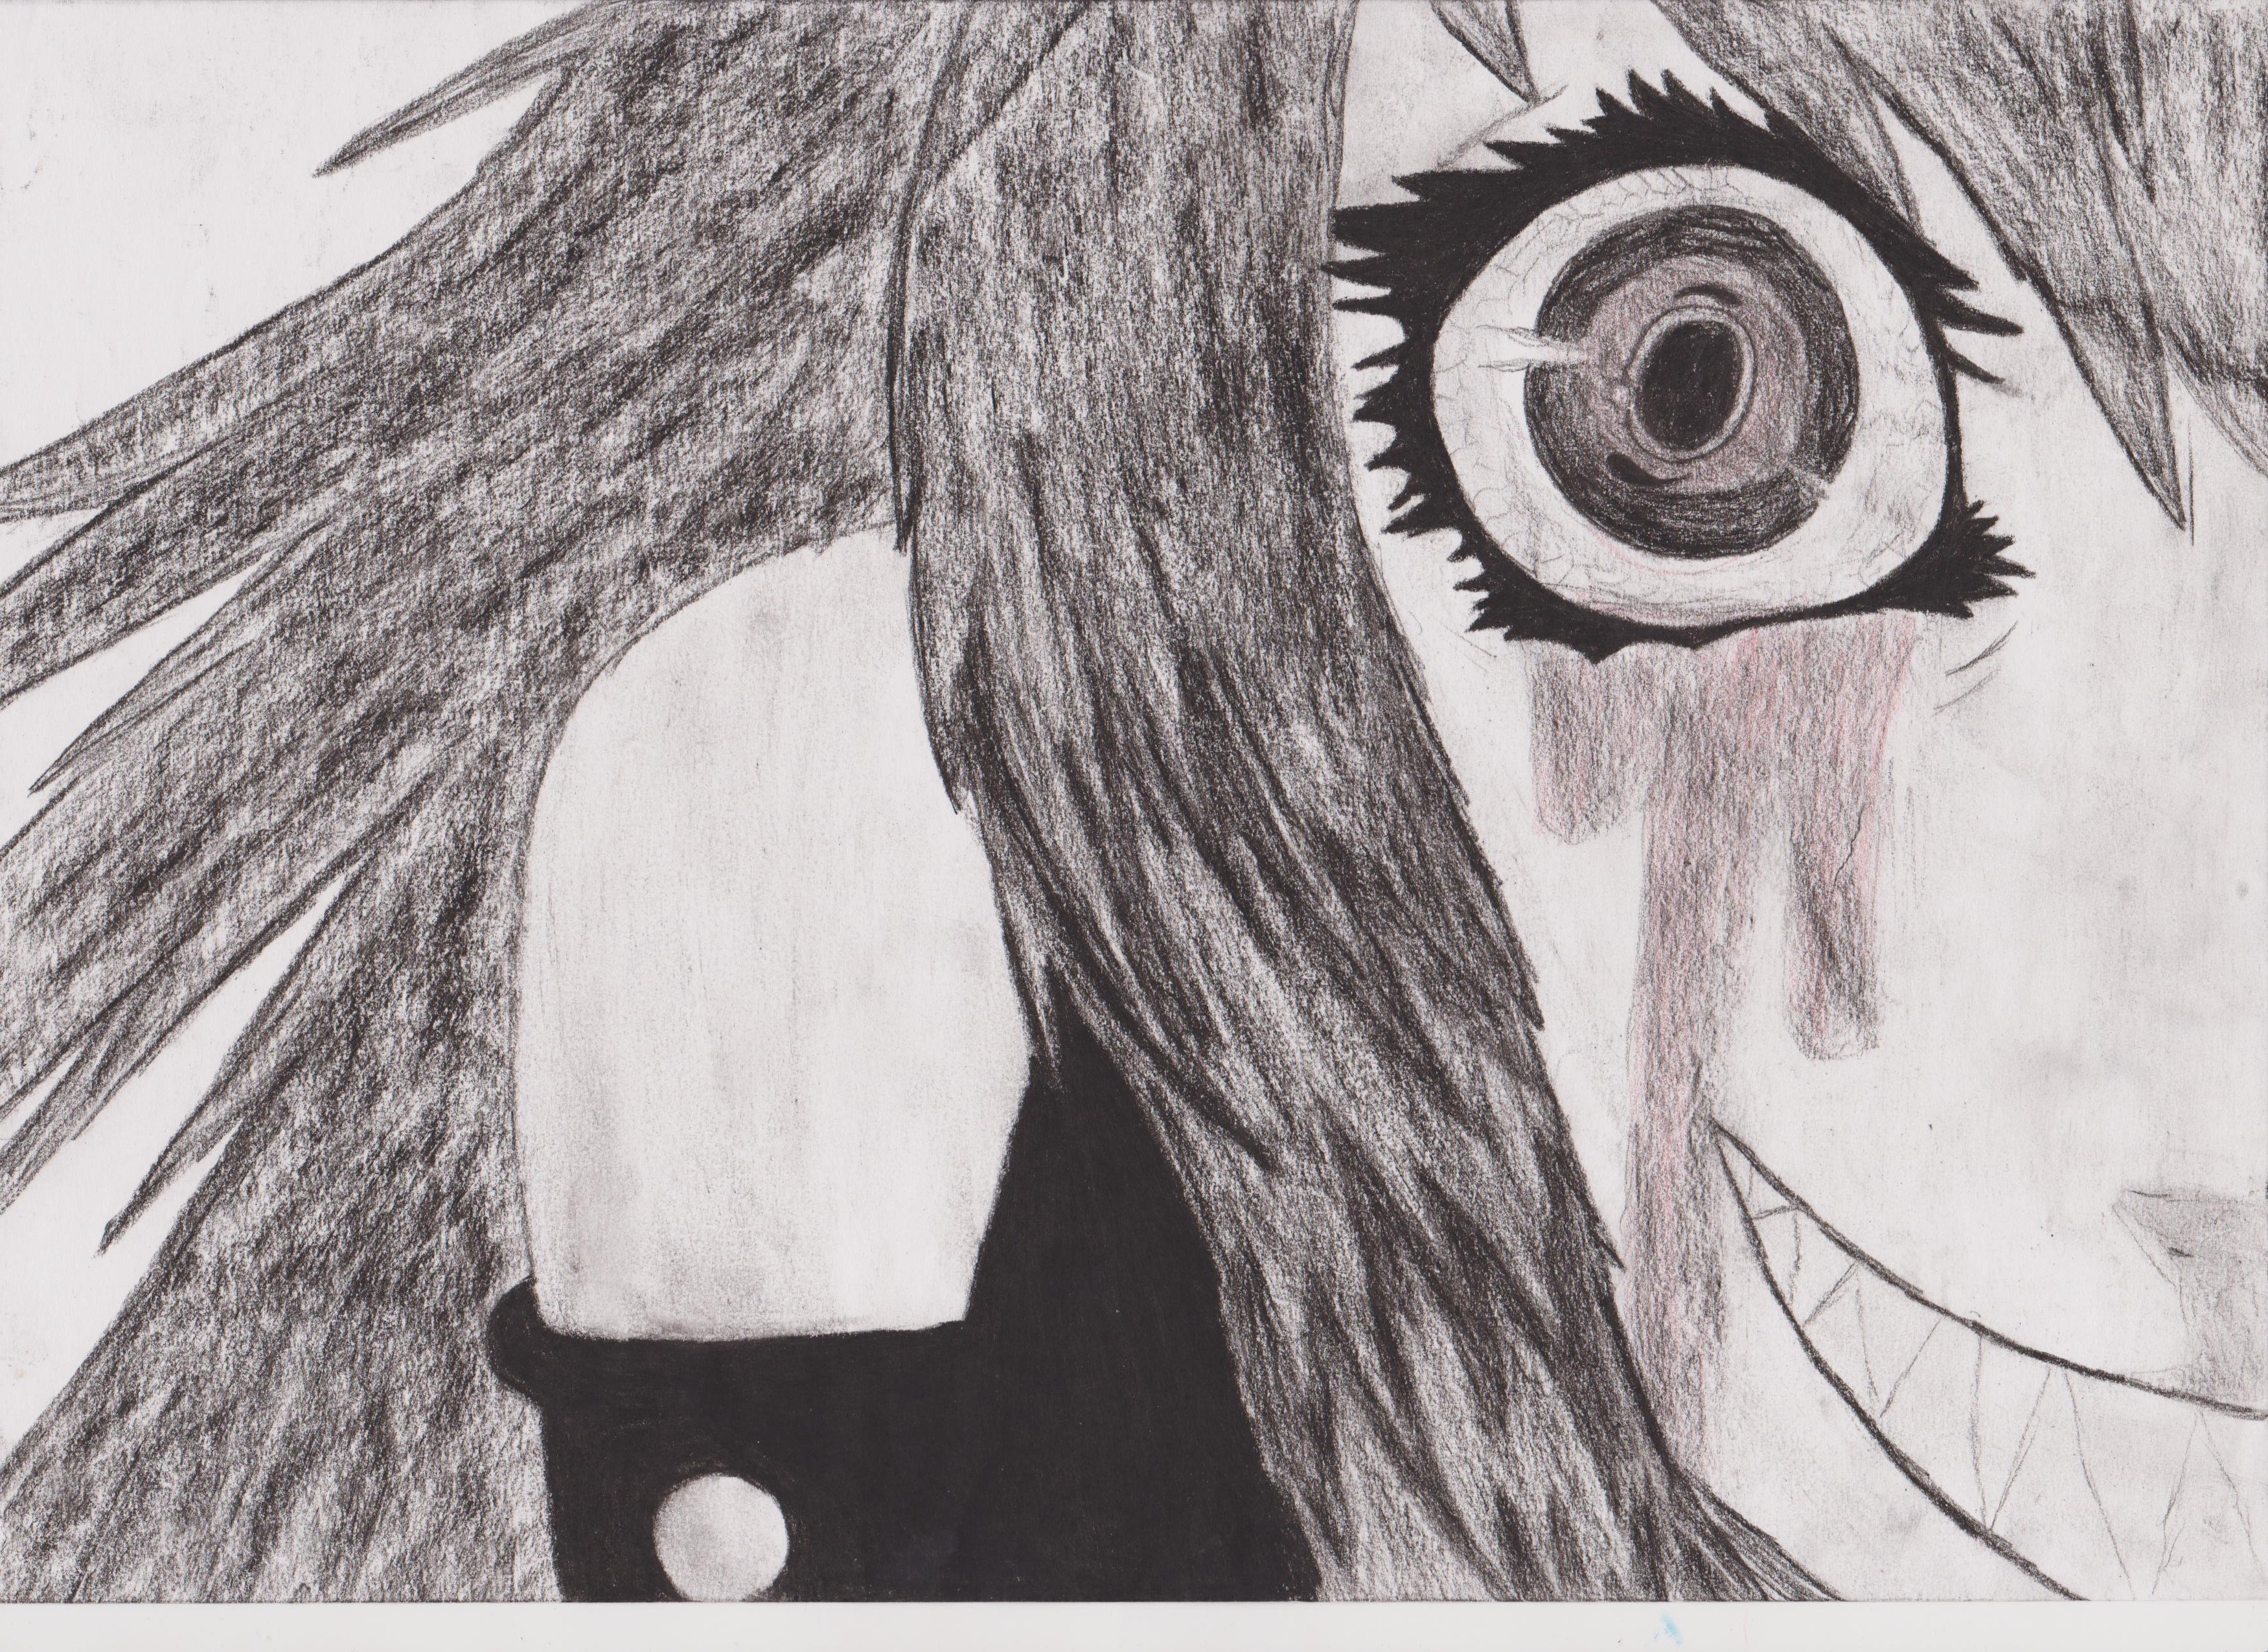 Creepy Anime Girl By ShionSonozakii On DeviantArt